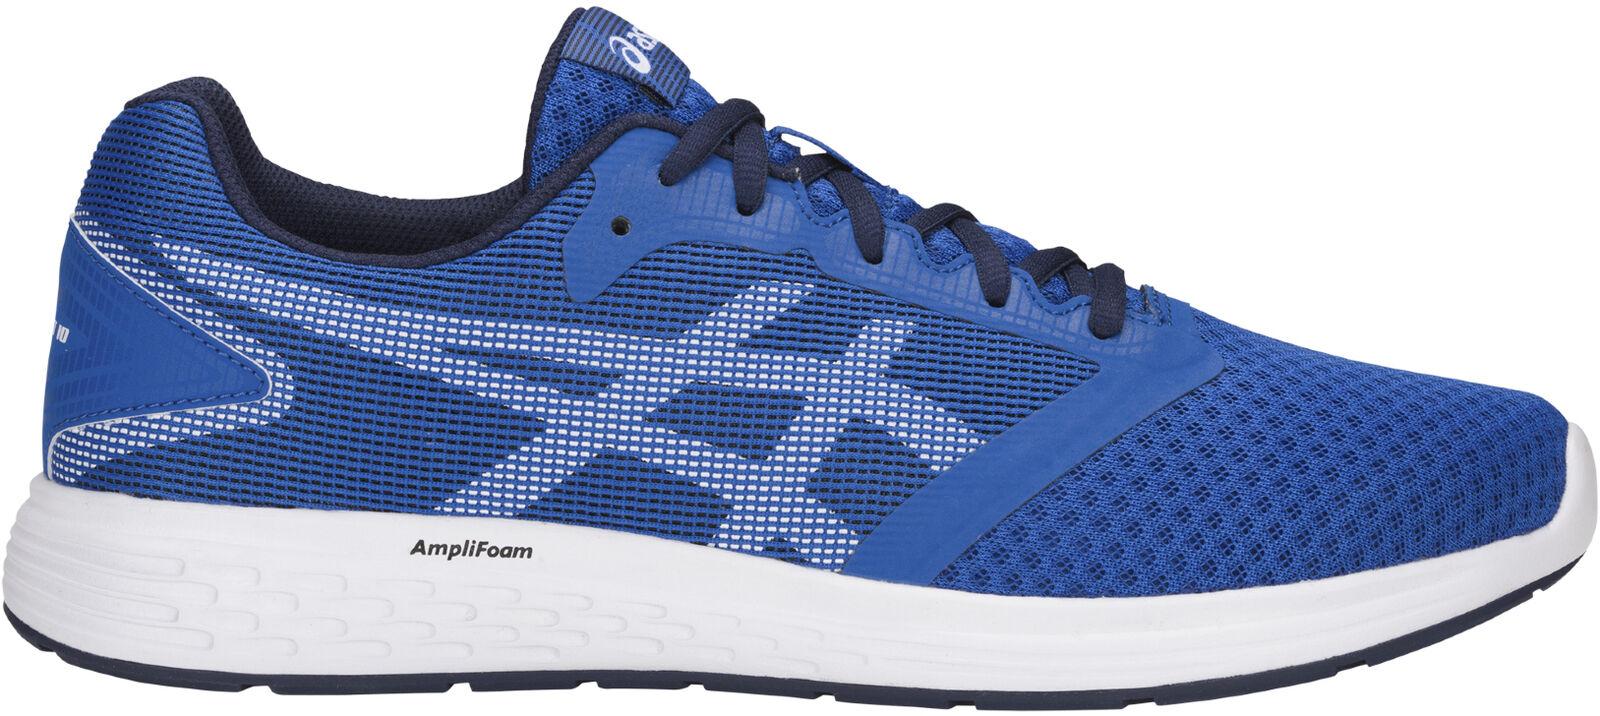 Asics Patriot 10 Mens Running shoes - bluee